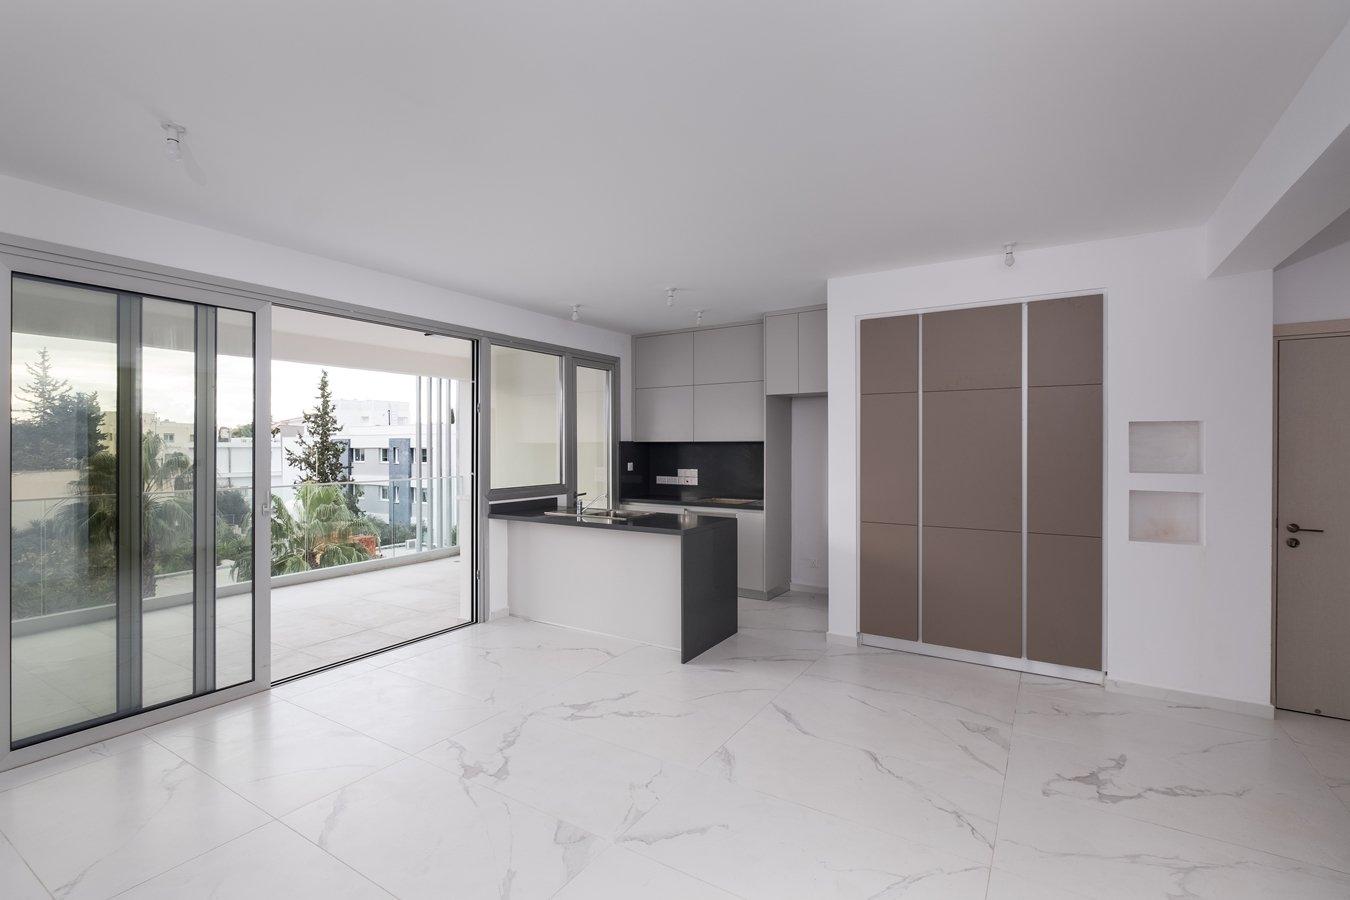 Kitchen 2 bedroom apartment for sale nicosia